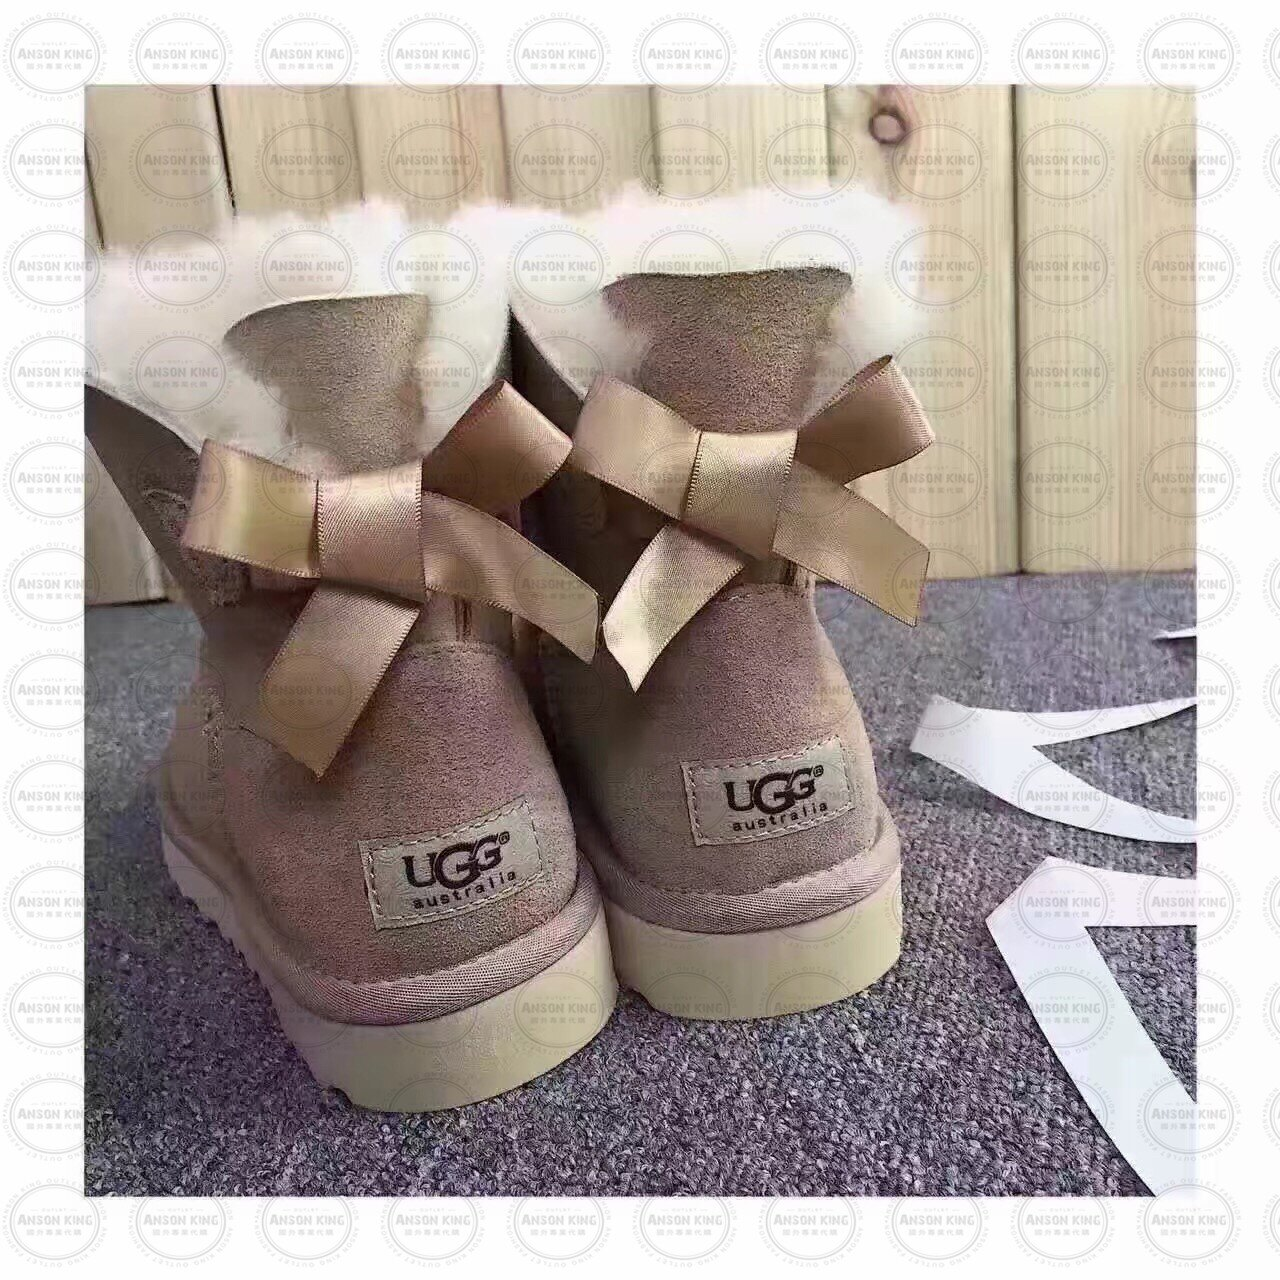 OUTLET正品代購 澳洲 UGG 單蝴蝶結羊皮毛一體 中長靴 保暖 真皮羊皮毛 雪靴 短靴 摩卡色 0